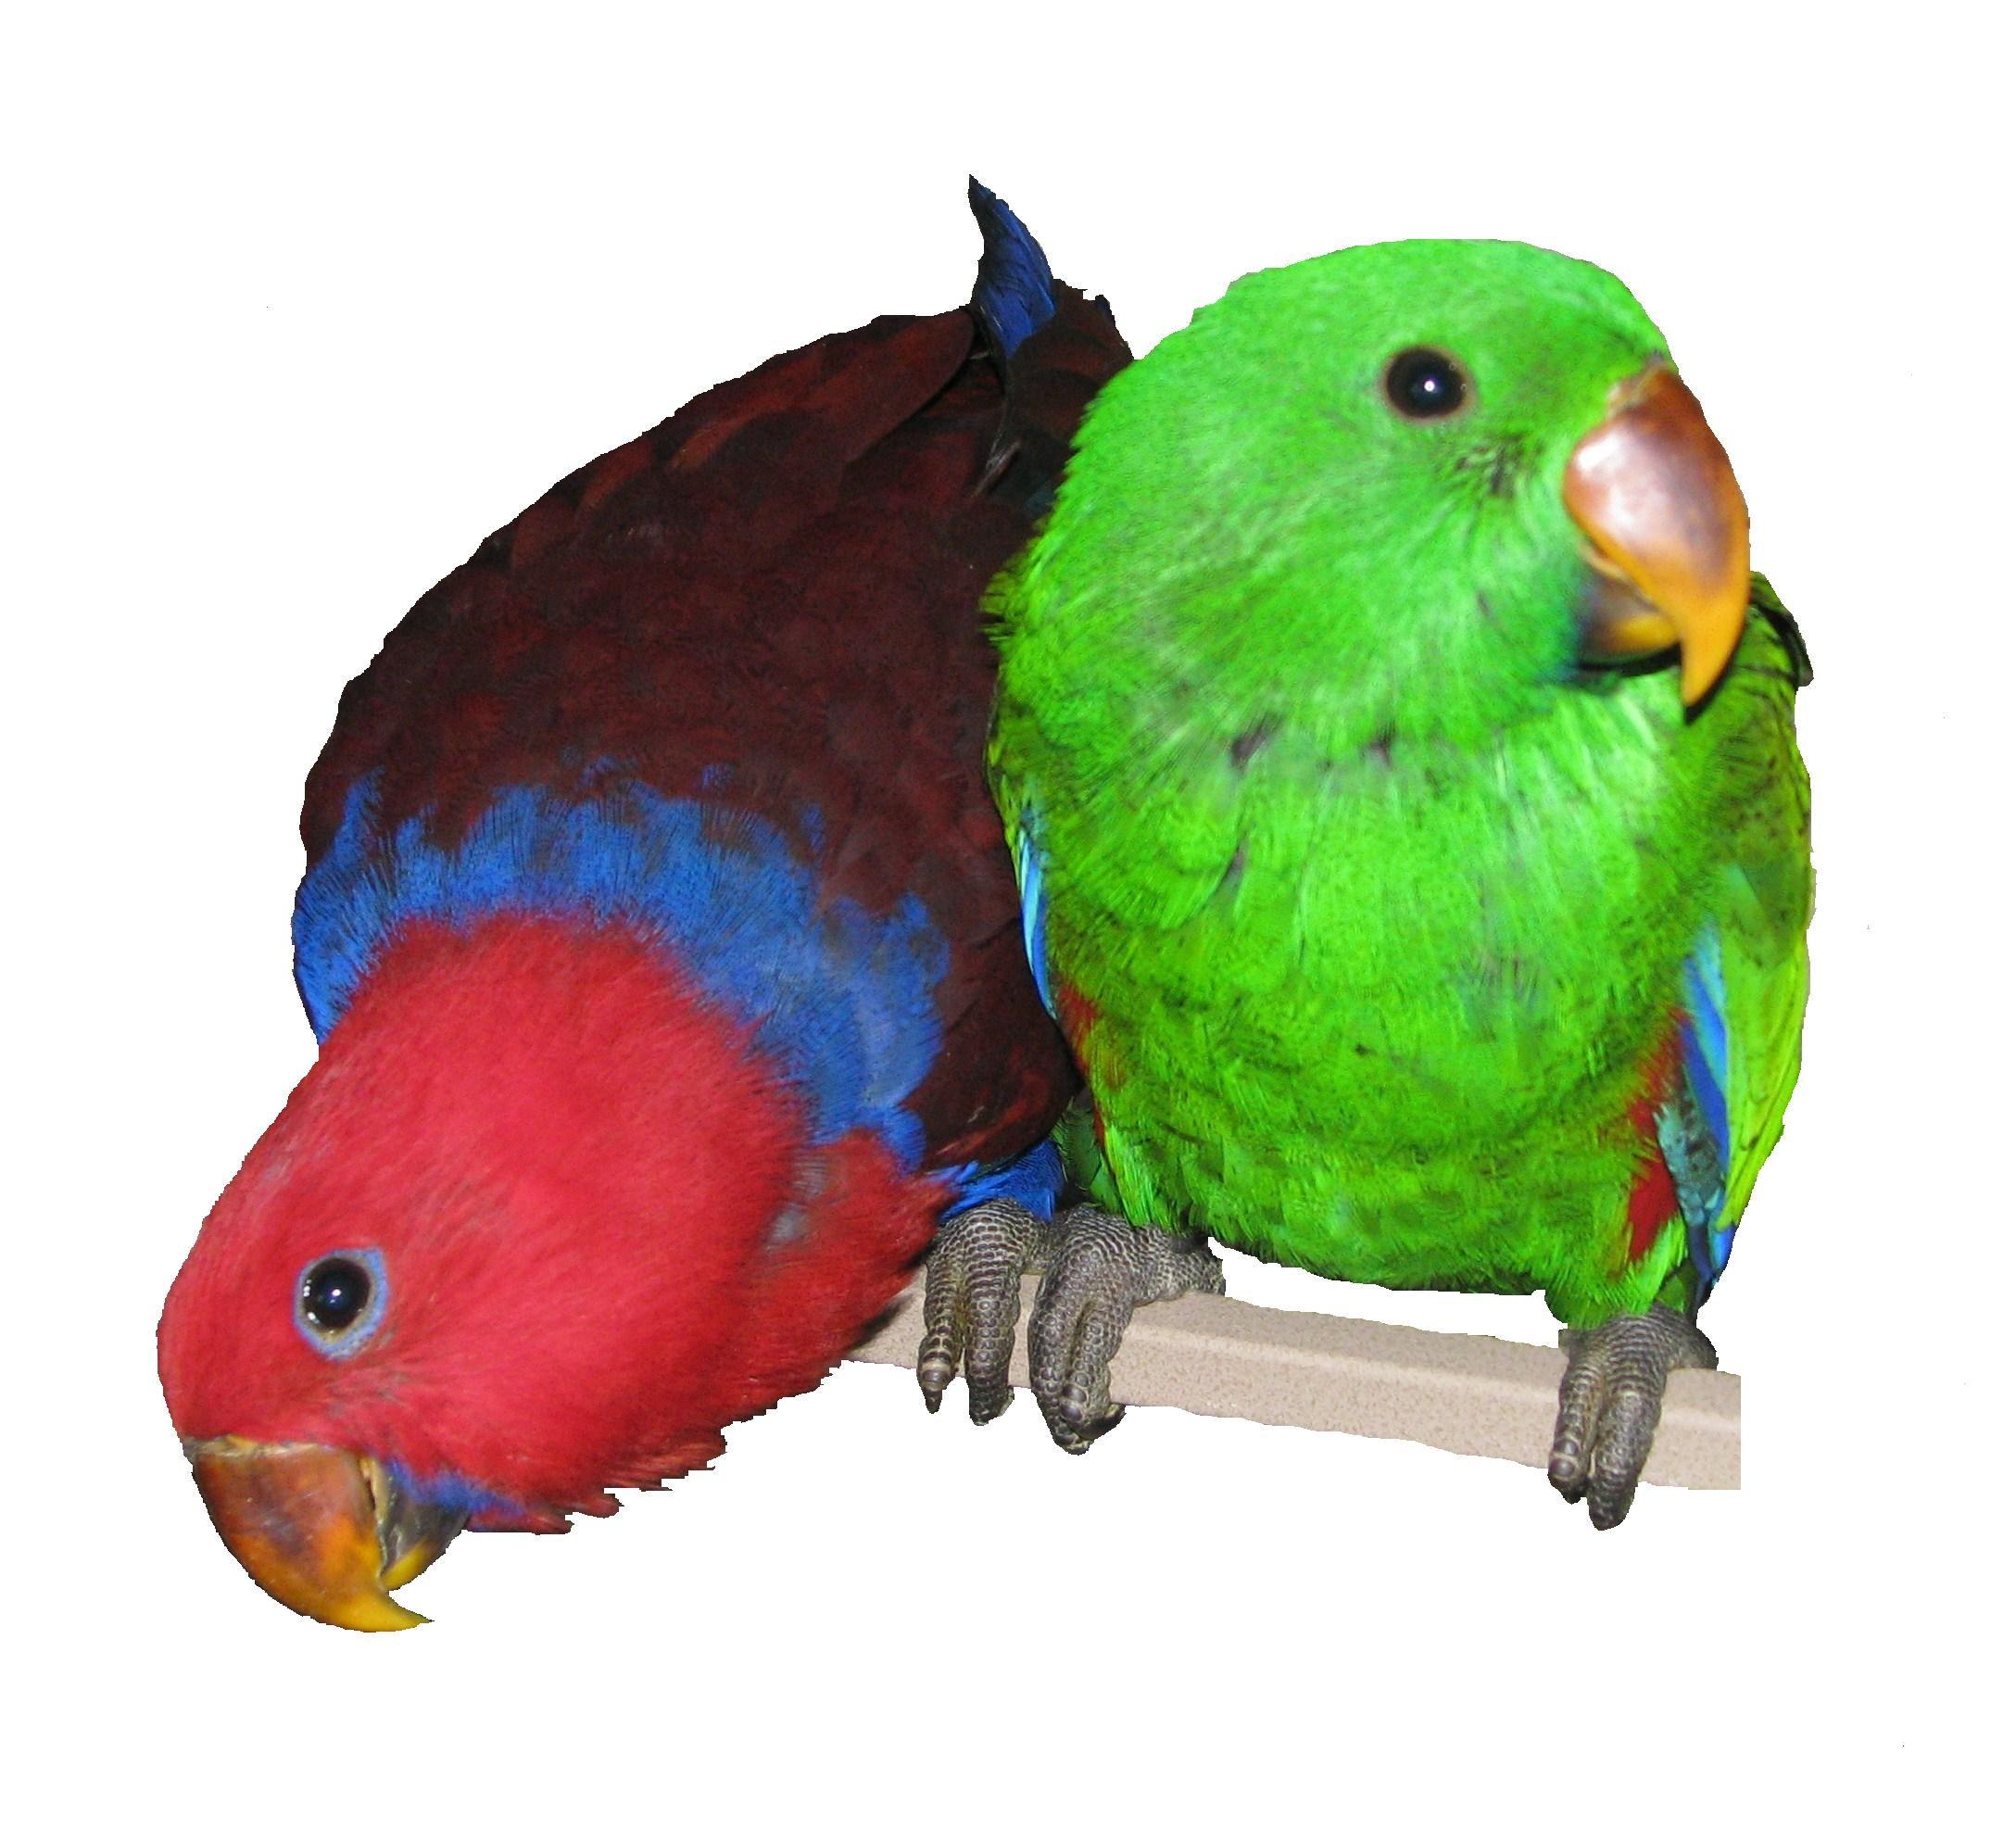 Recipes several, Bird supplies, Parrot bird, Birds